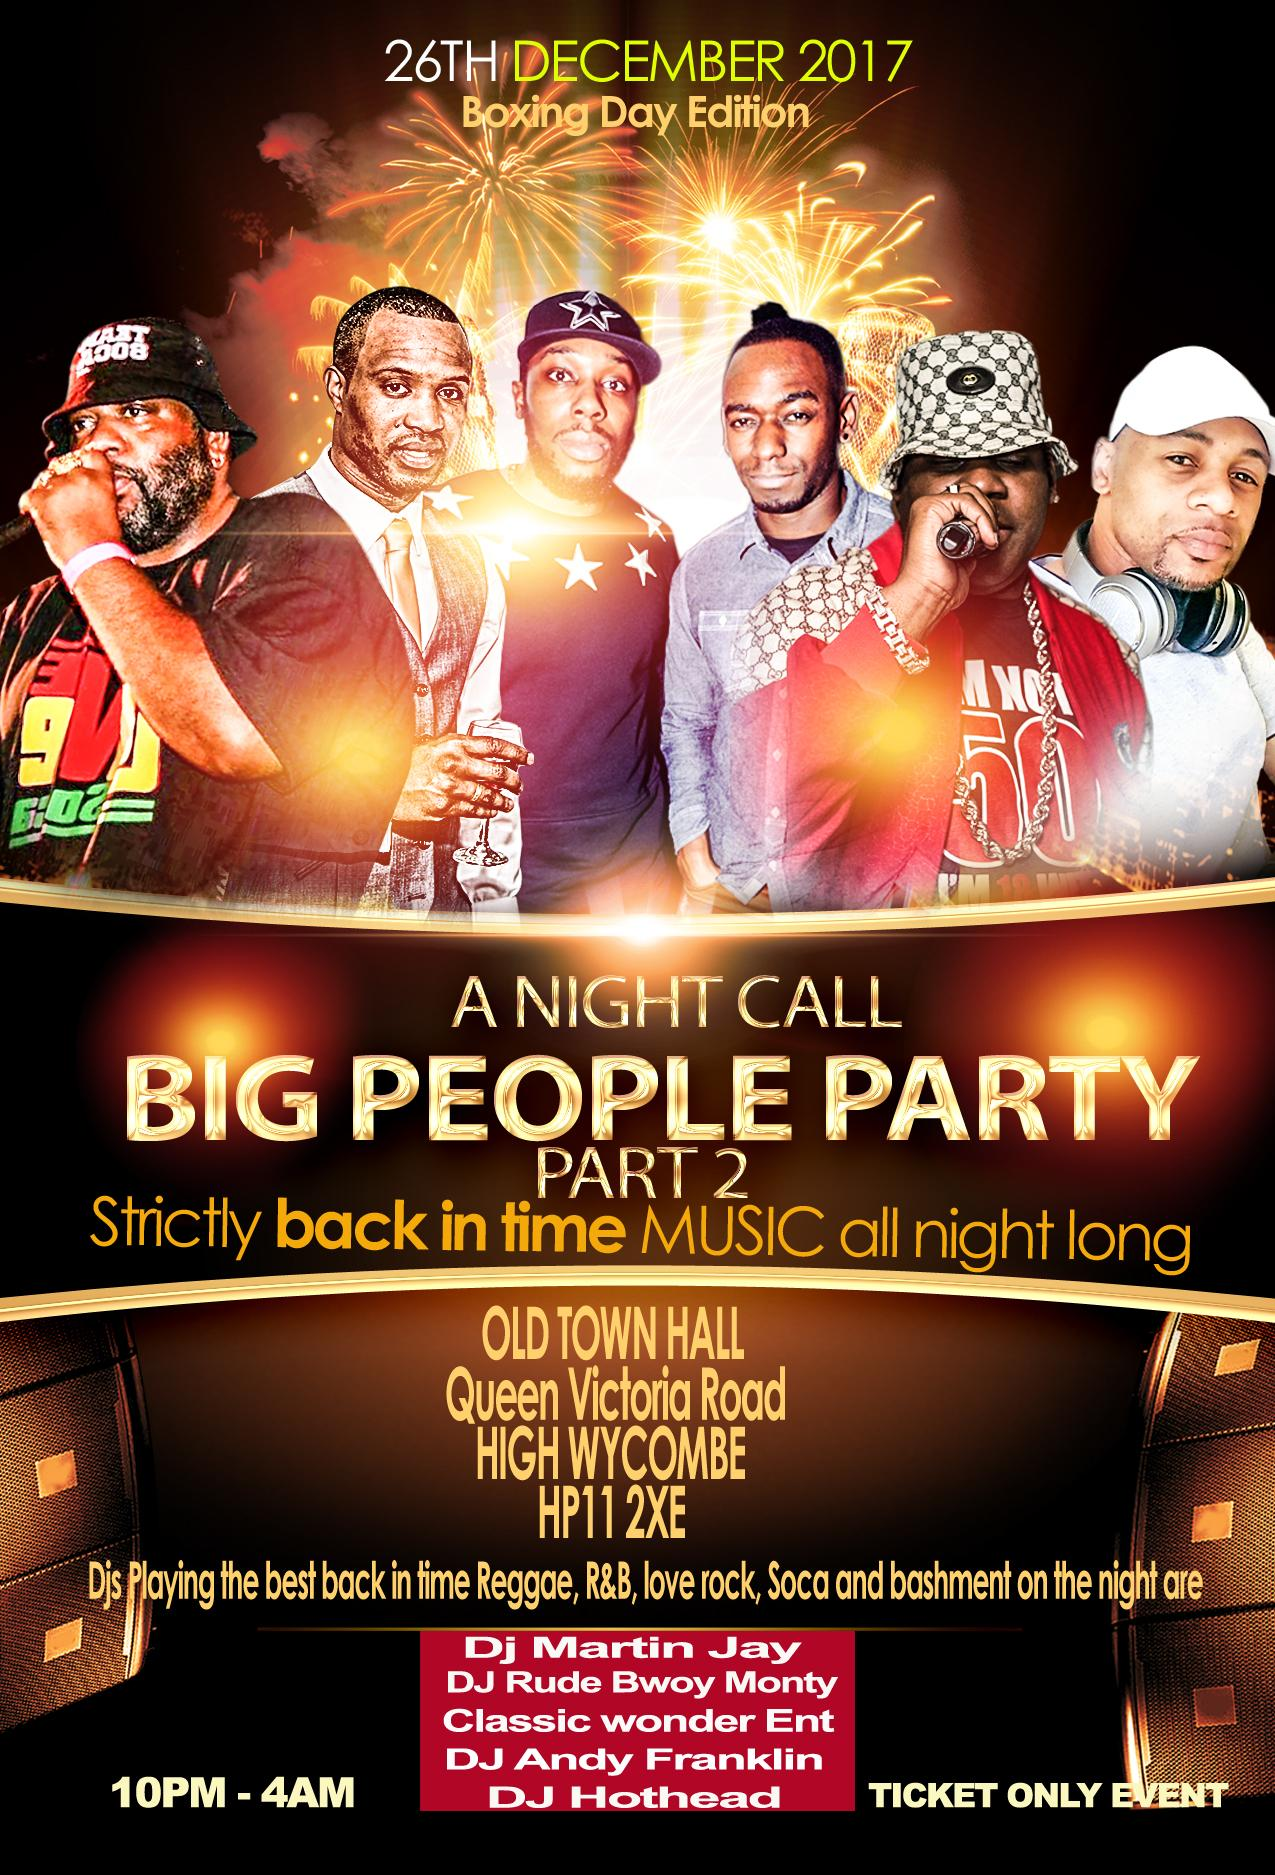 BIG PEOPLE PARTY - Part 2 | Blacknet UK